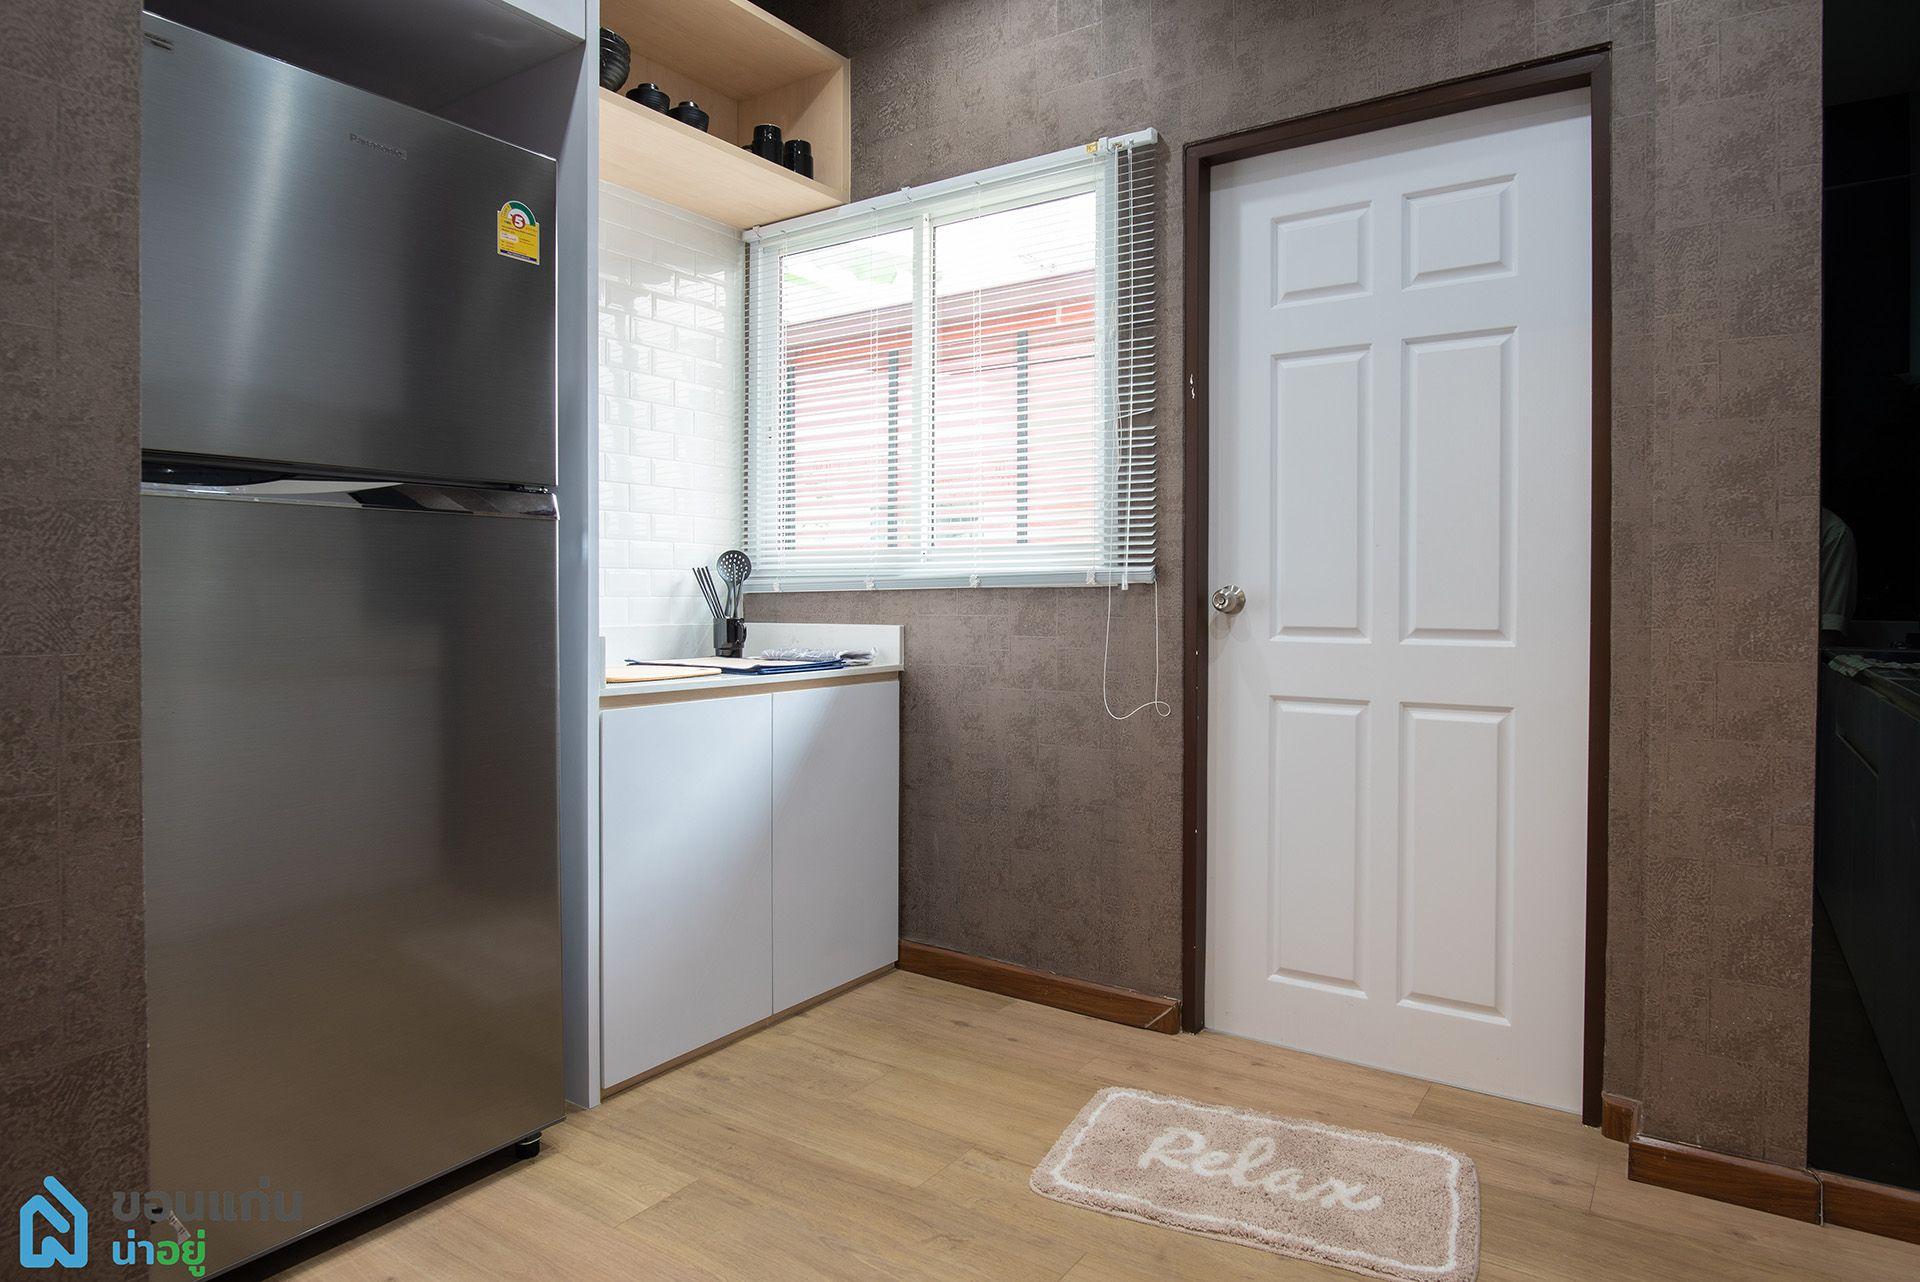 TYPE B : พื้นที่ห้องครัว